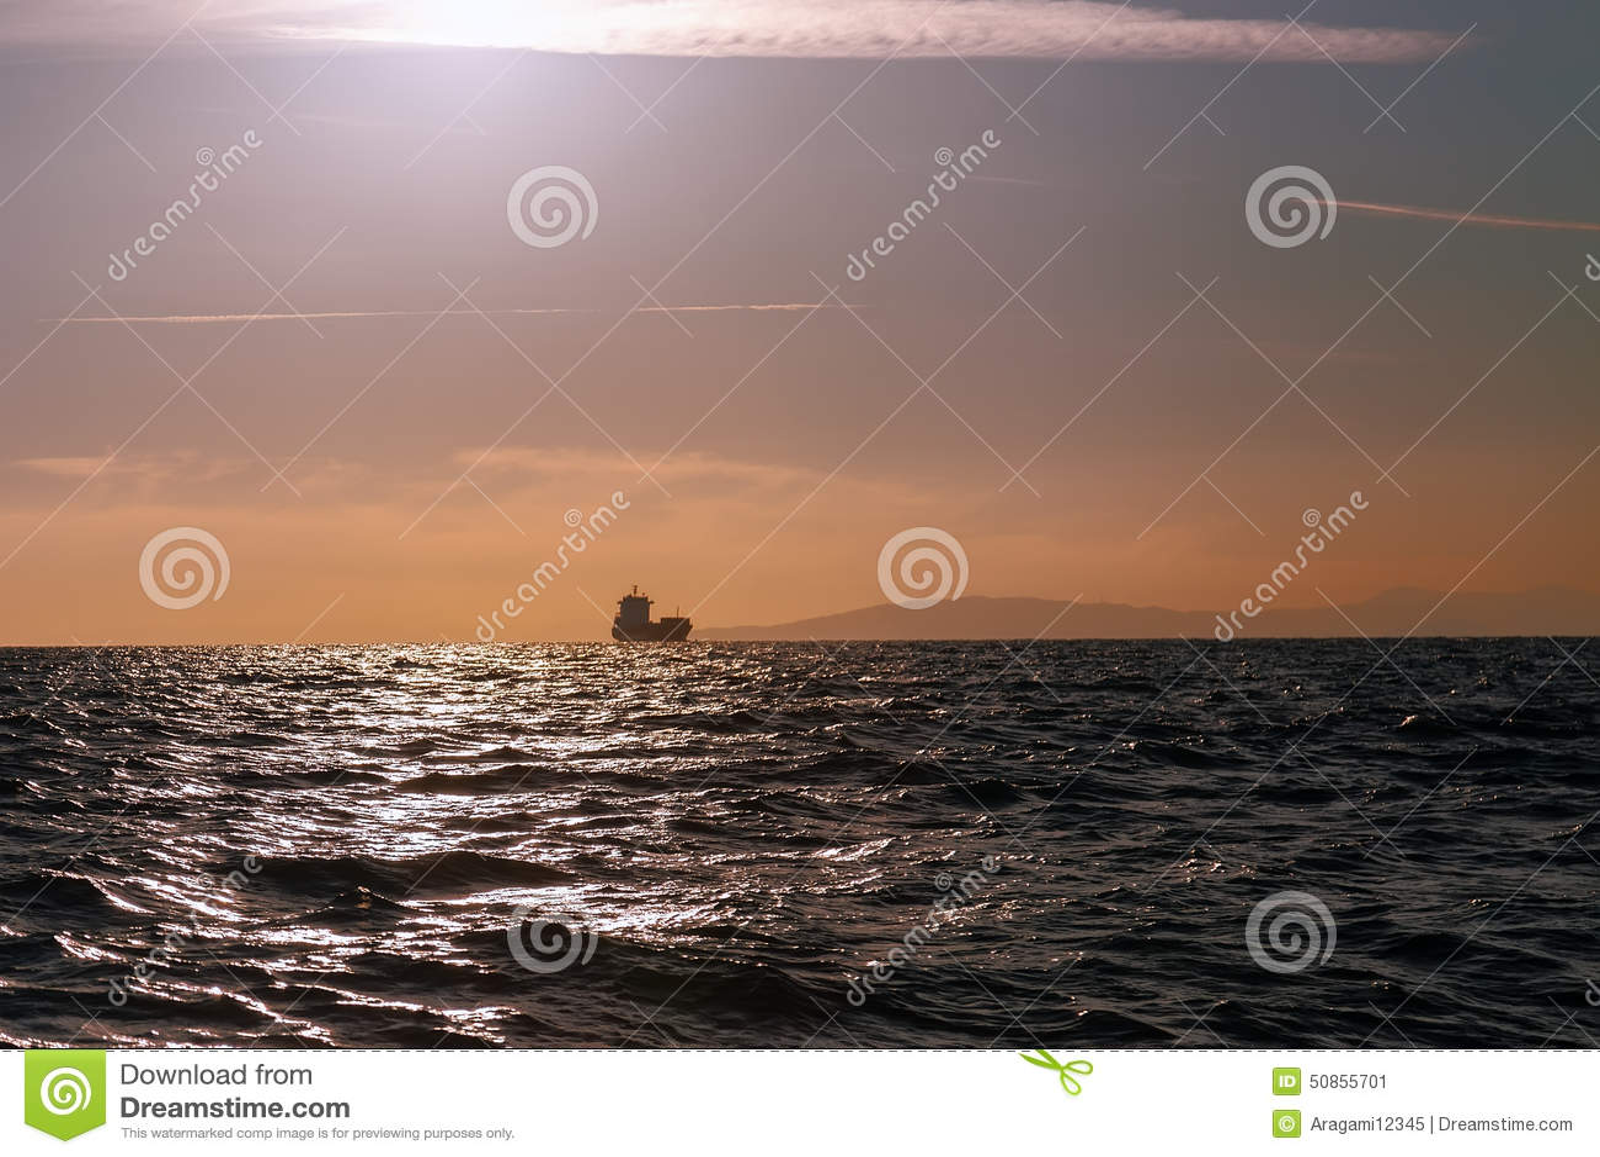 Massentransportmittelschiffssegeln im Meer